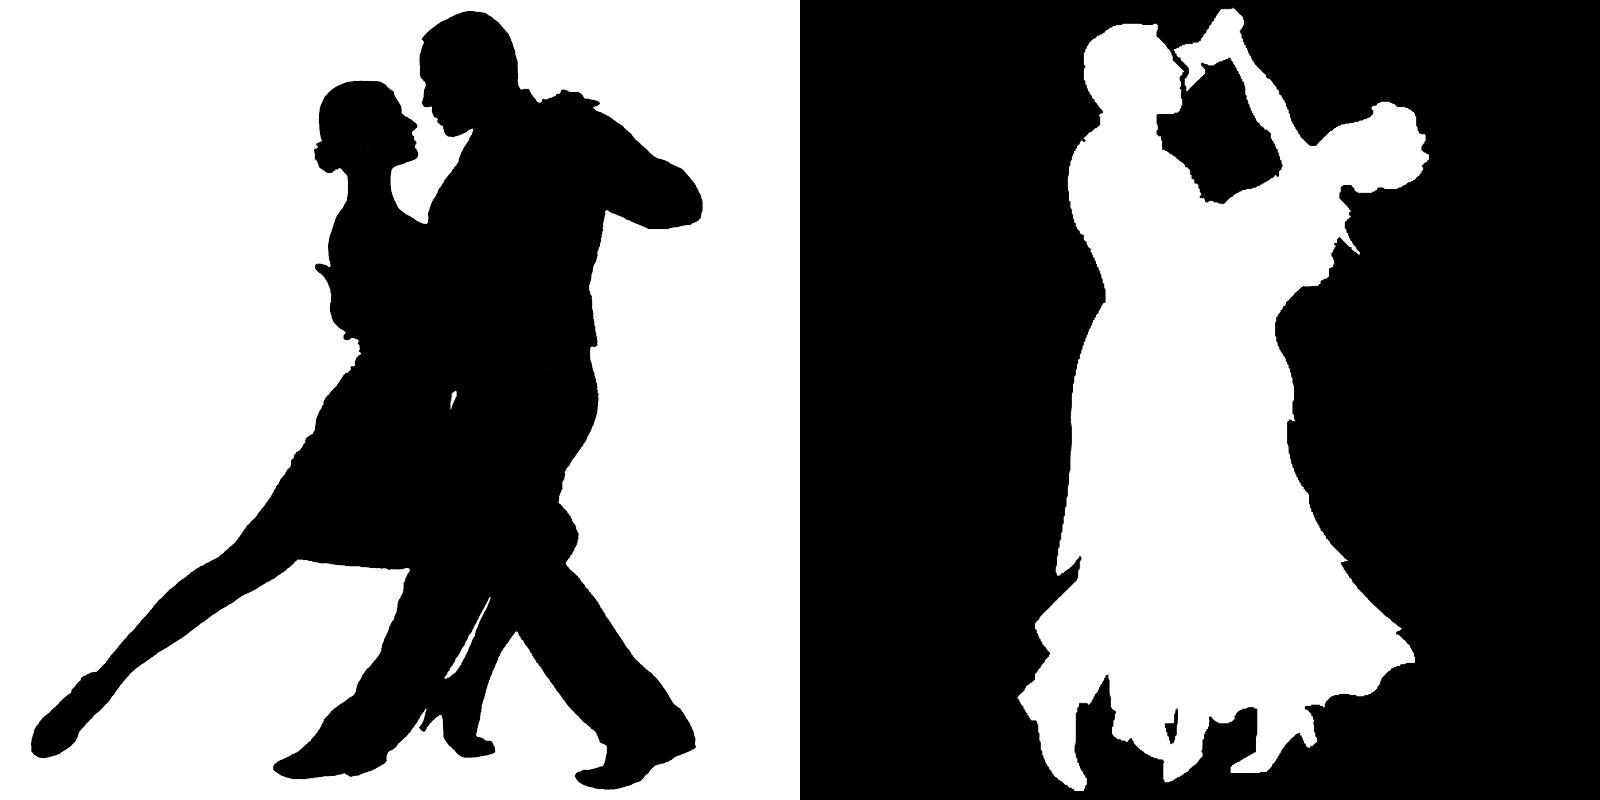 51e9672aca0 Στο Tango Argentino και στο Ballroom Tango χρησιμοποιούνται διαφορετικές  τεχνικές. Το tango σε Αργεντινή και Ουρουγουάη χορεύεται με το κέντρο του  σώματος ...